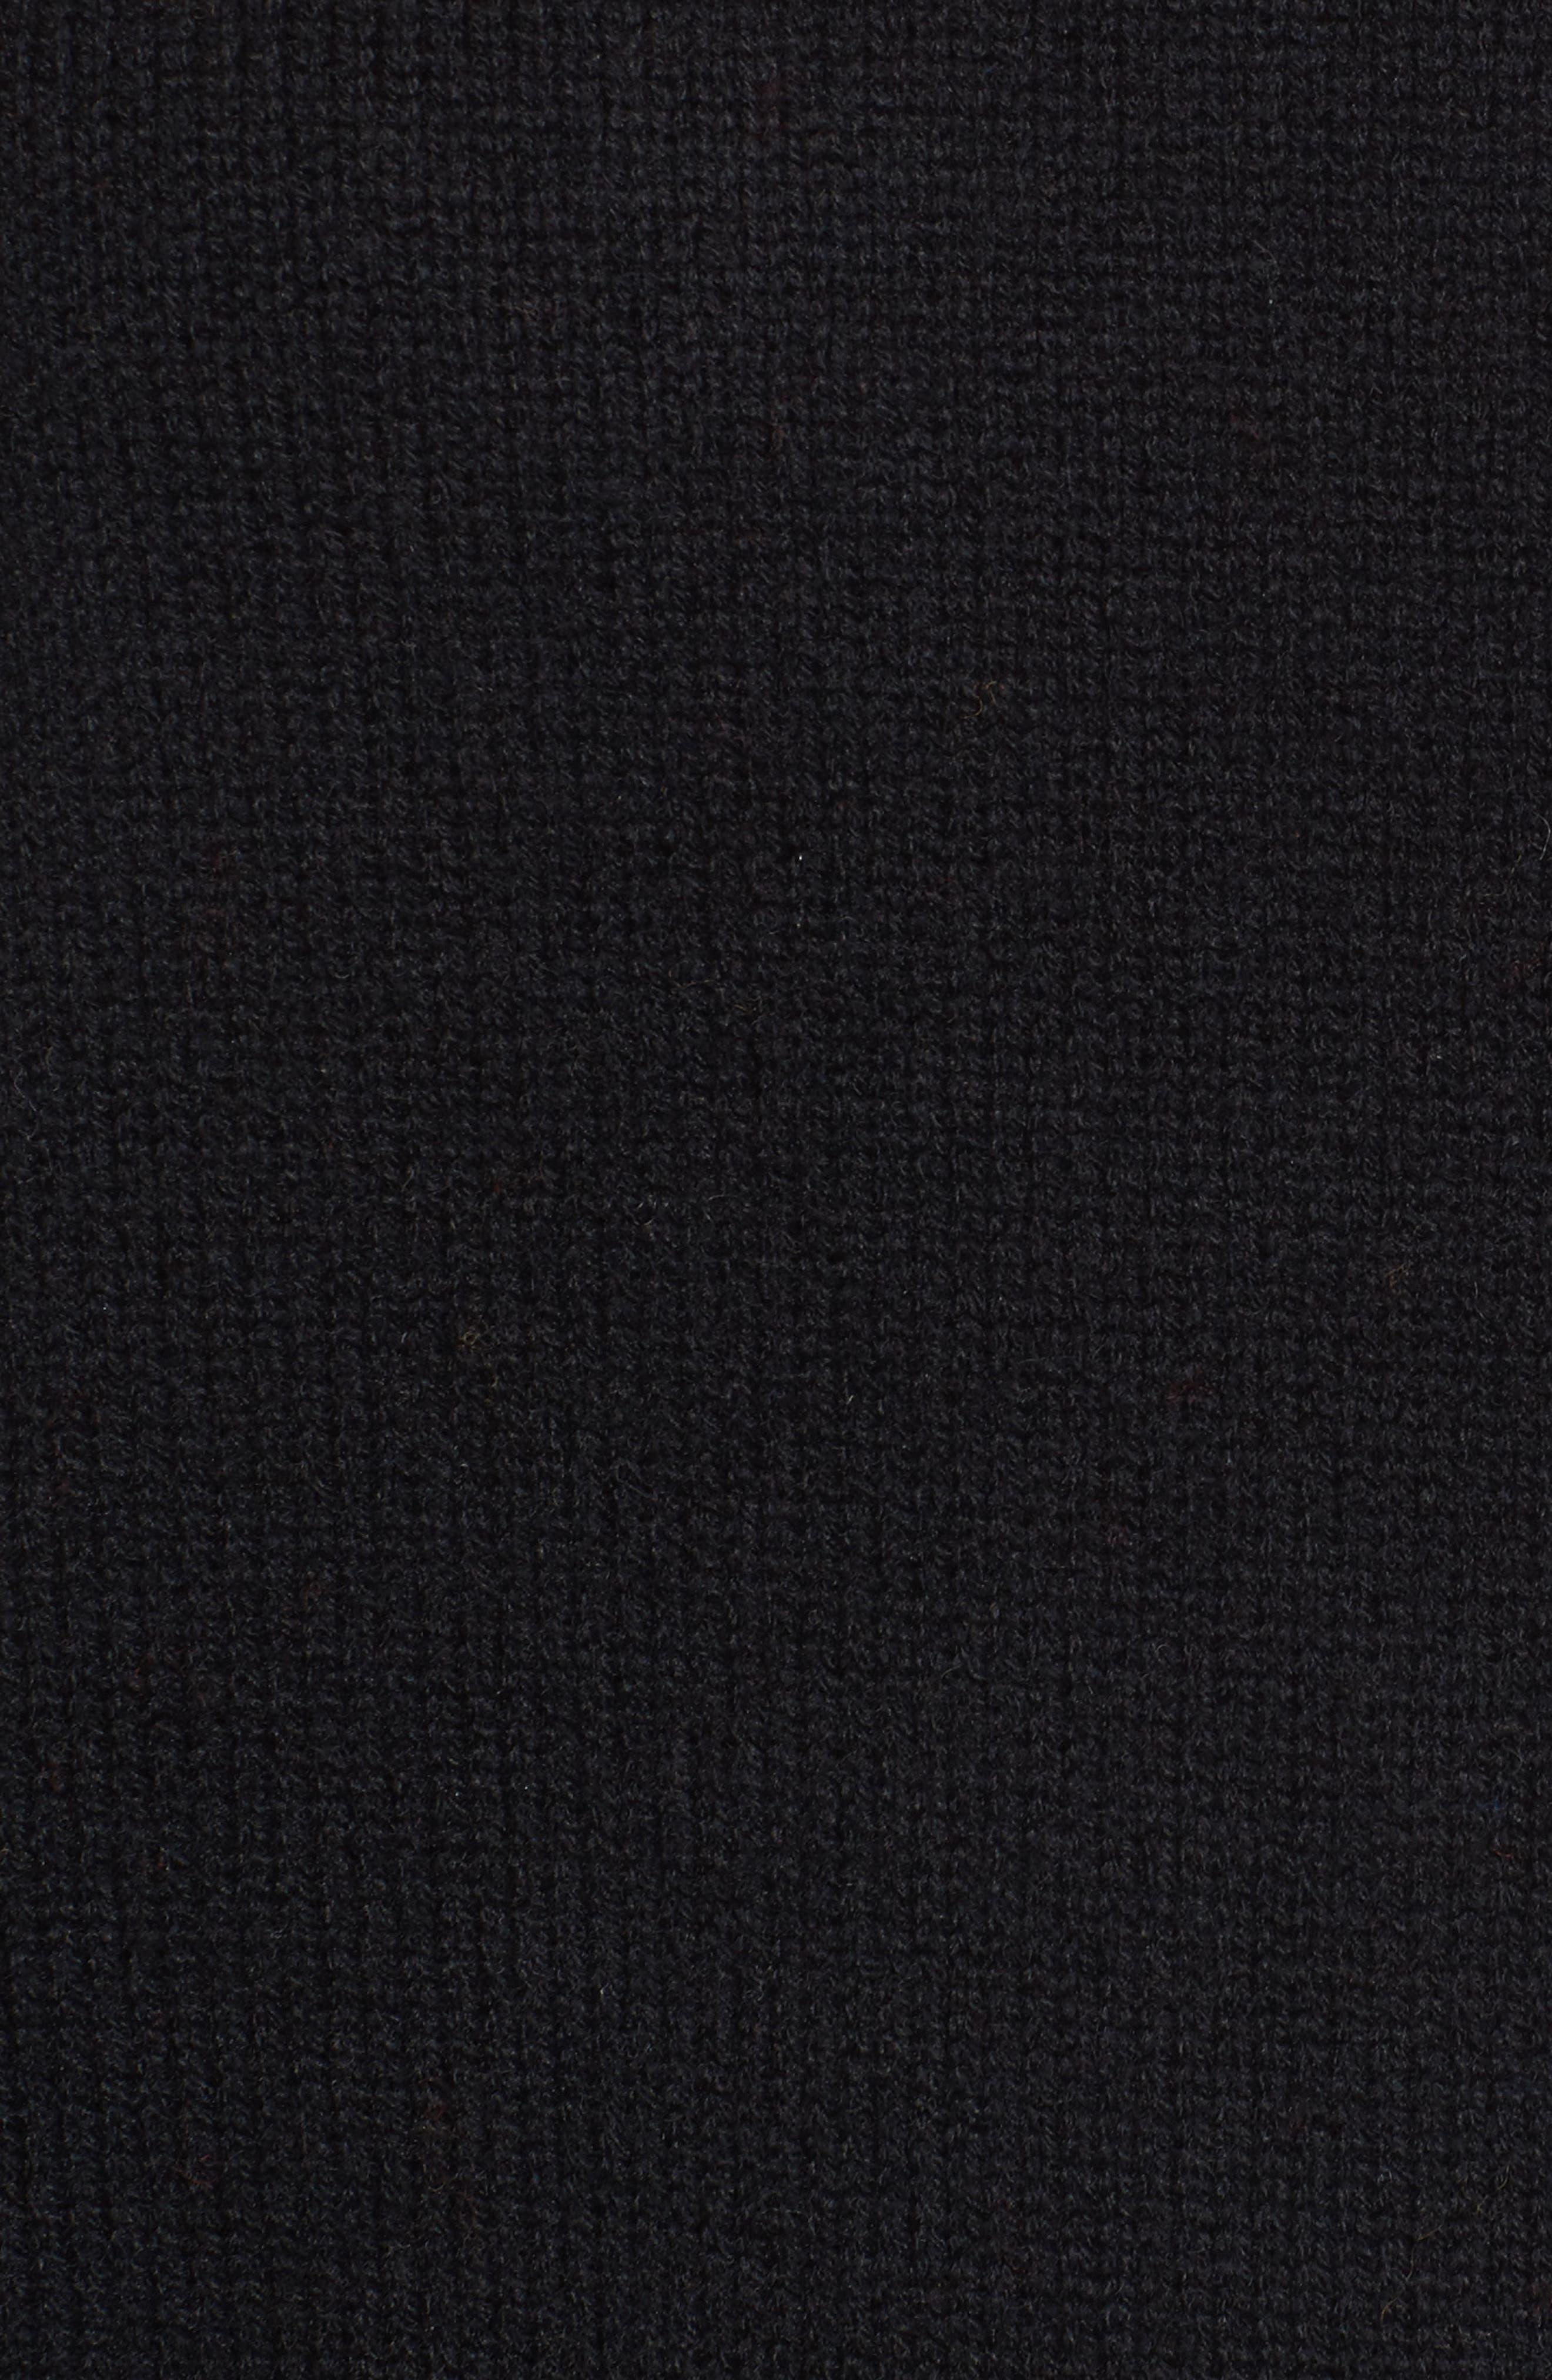 Spirit Sweater,                             Alternate thumbnail 5, color,                             Black/ Gold